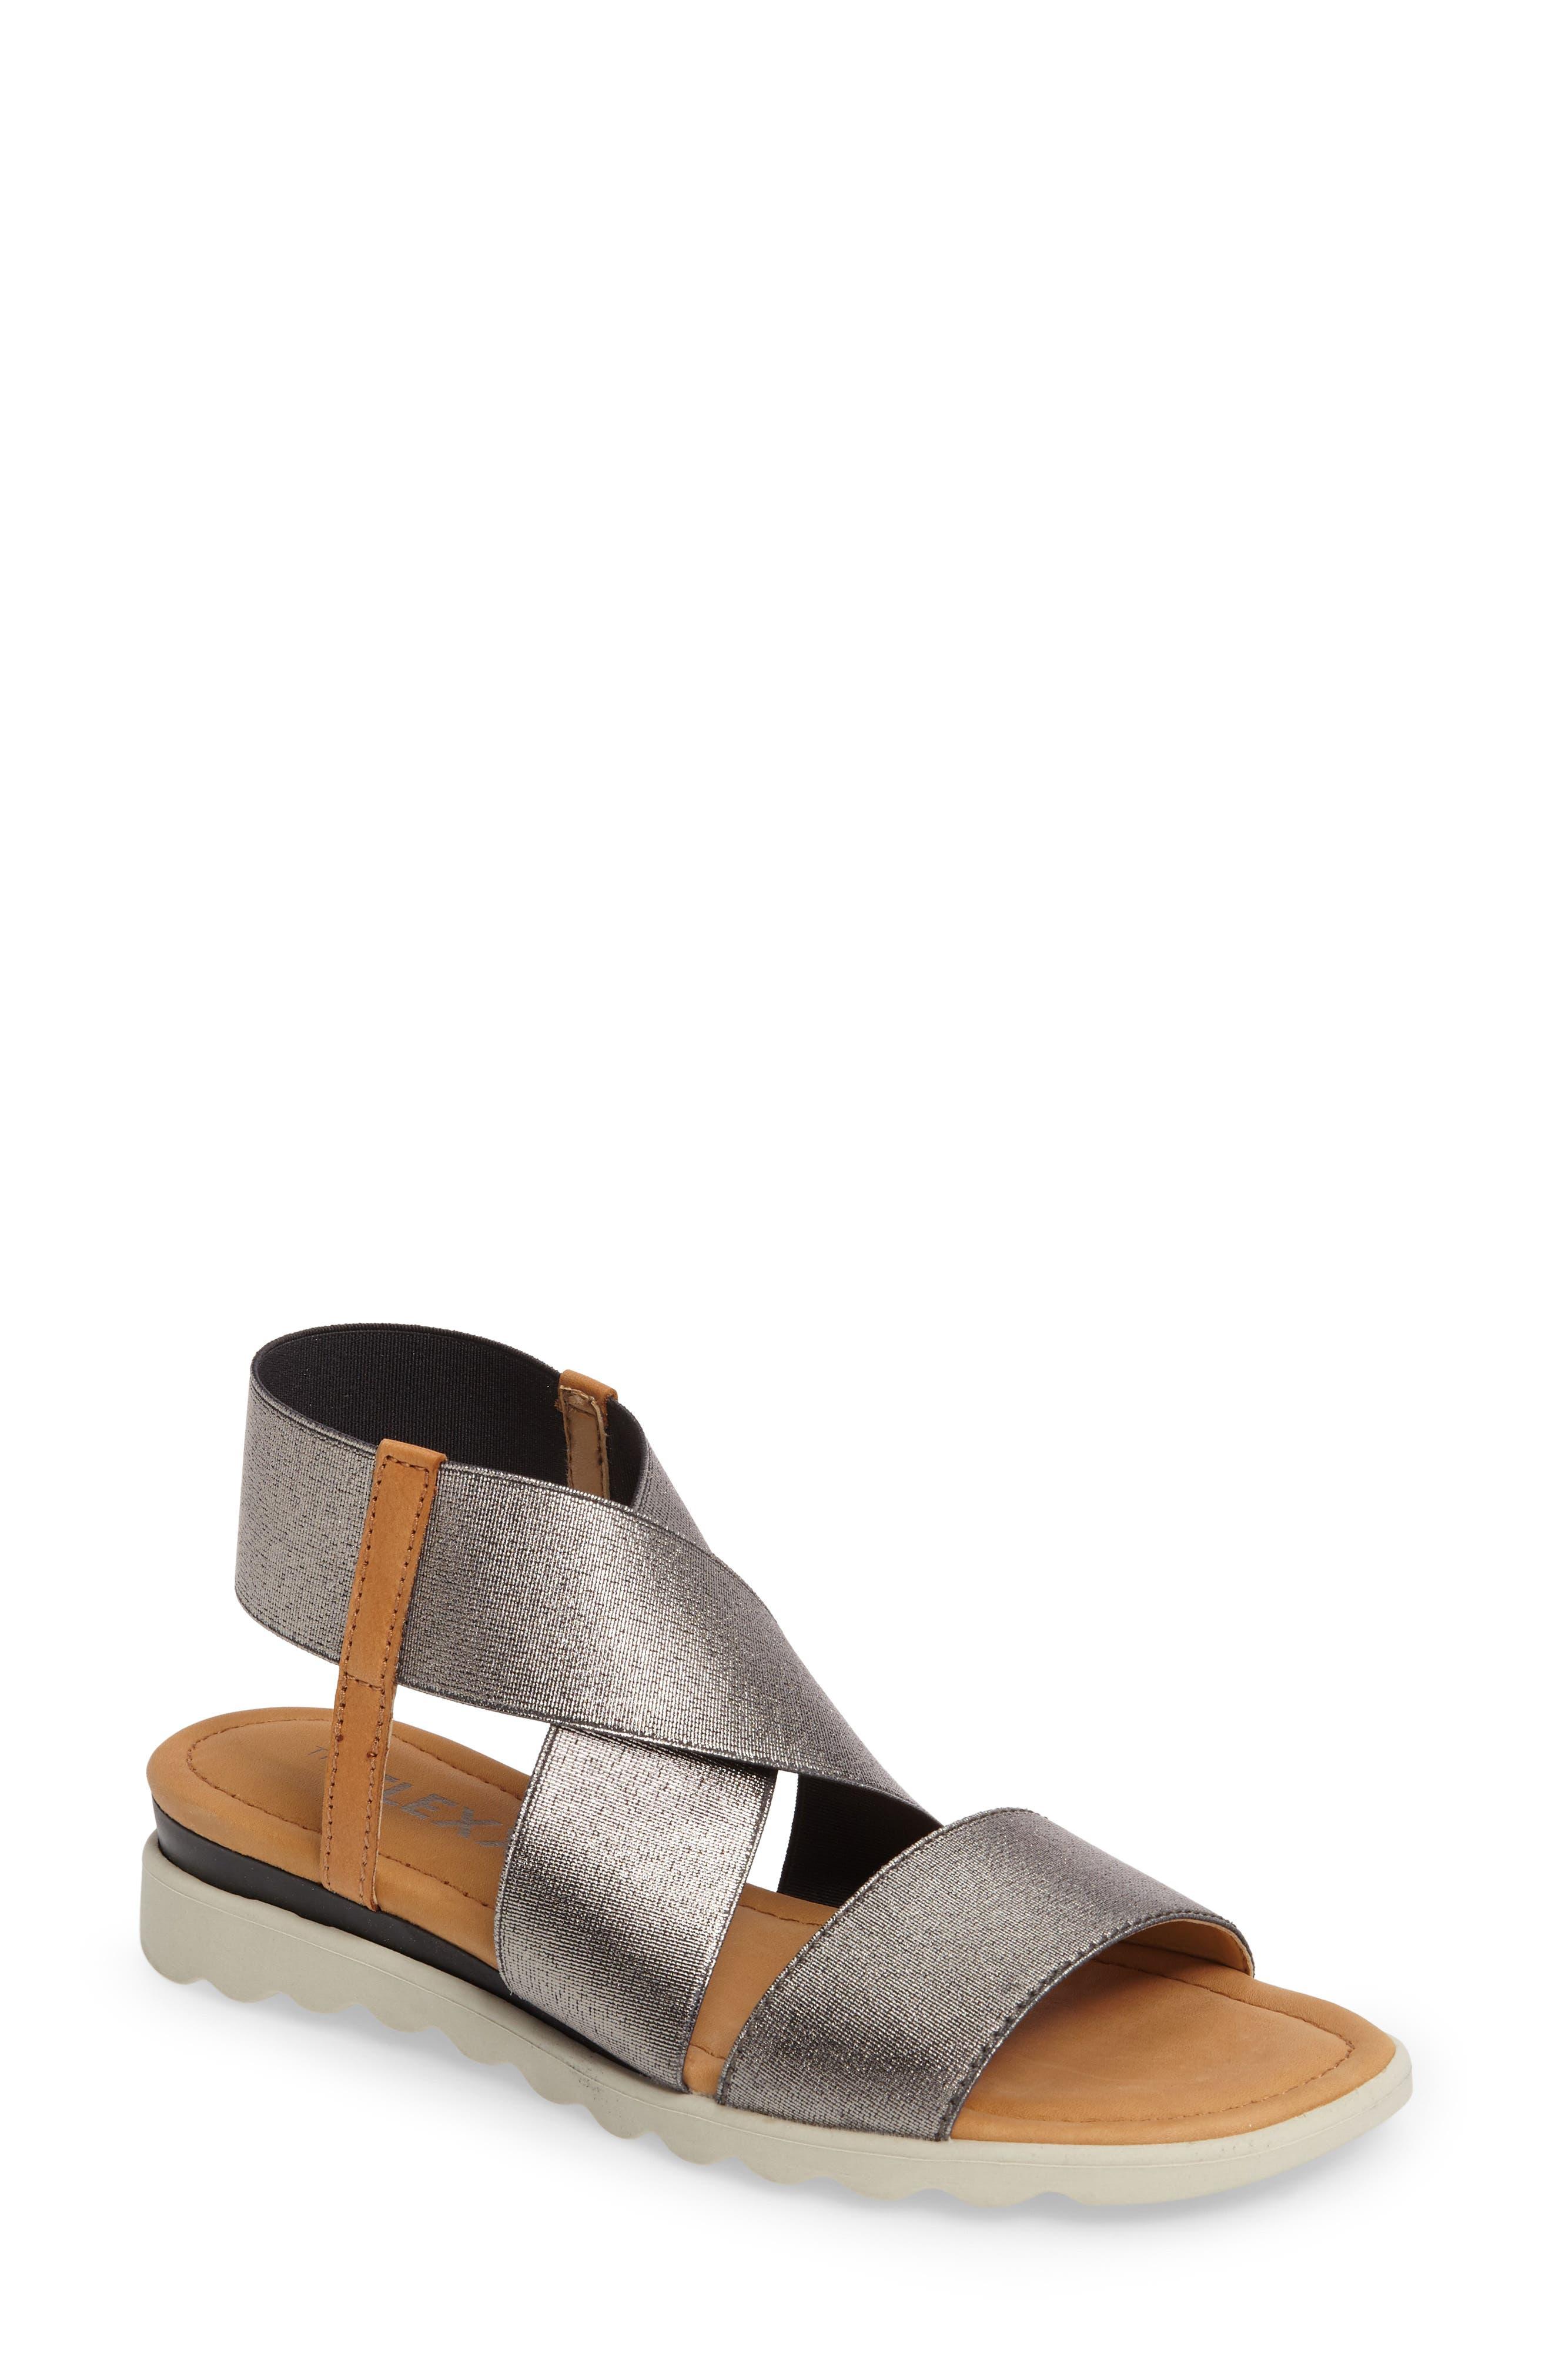 Alternate Image 1 Selected - The Flexx Extra Sandal (Women)